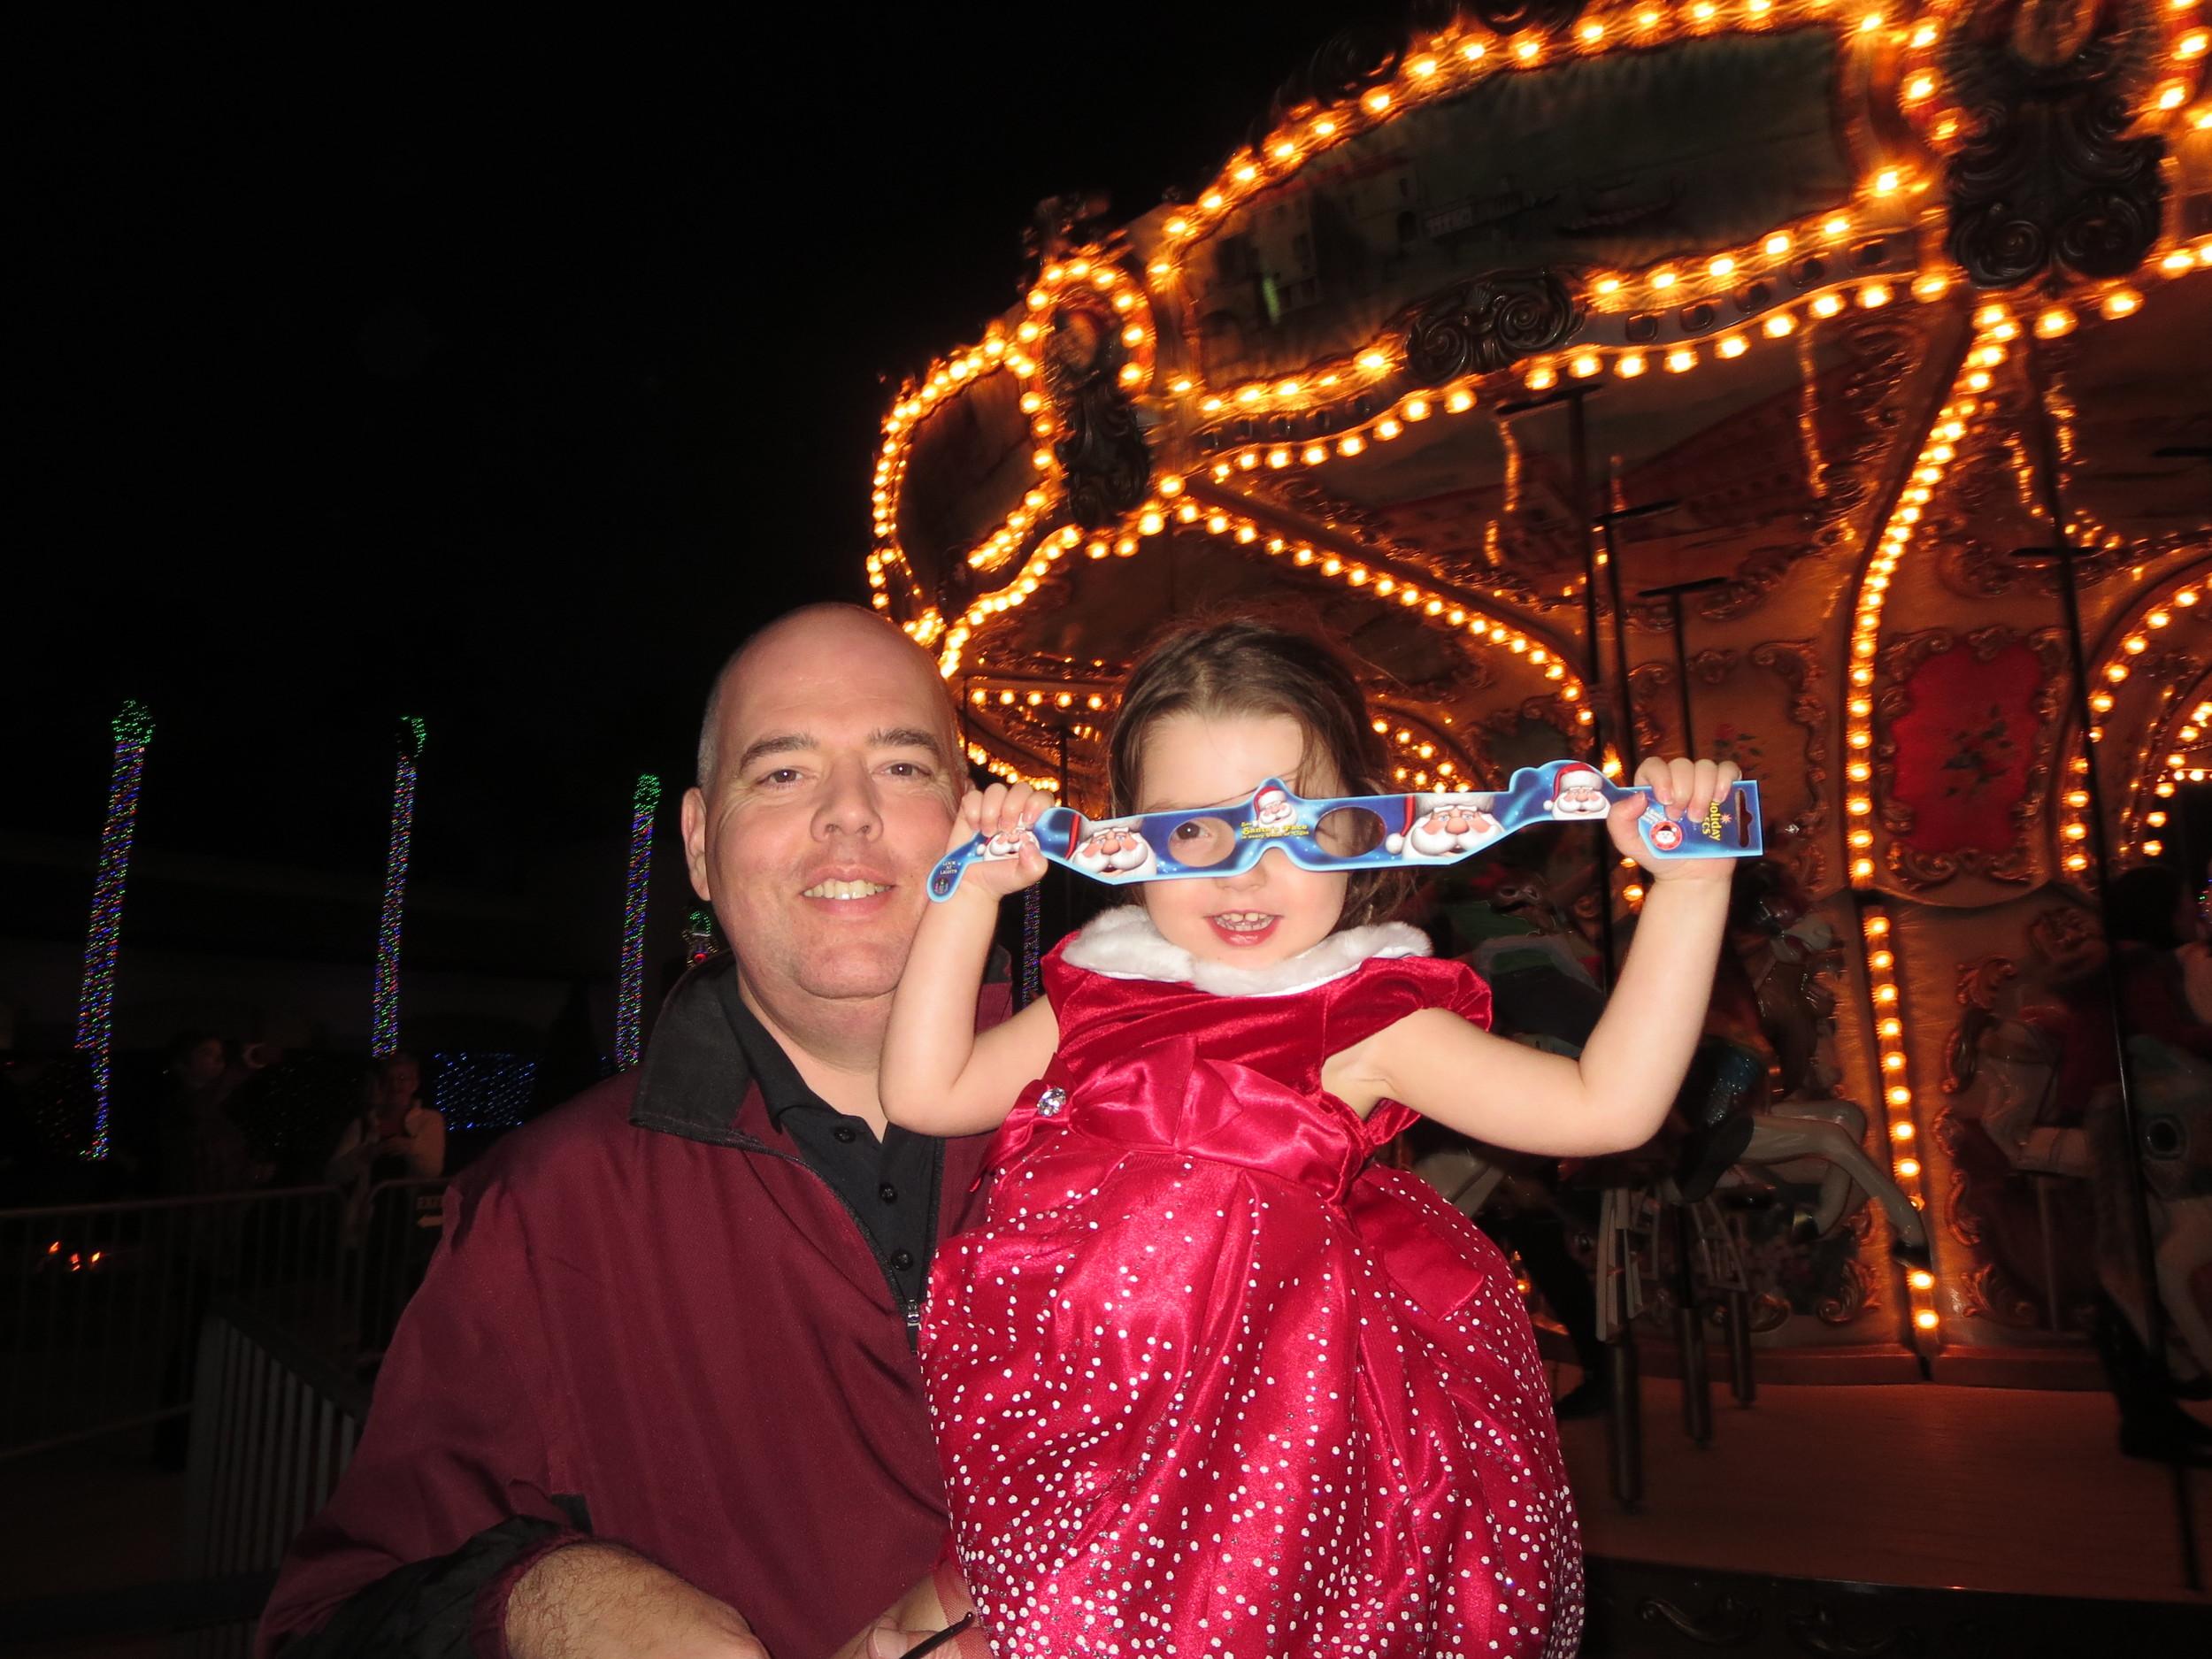 Carousel at S'mores Land